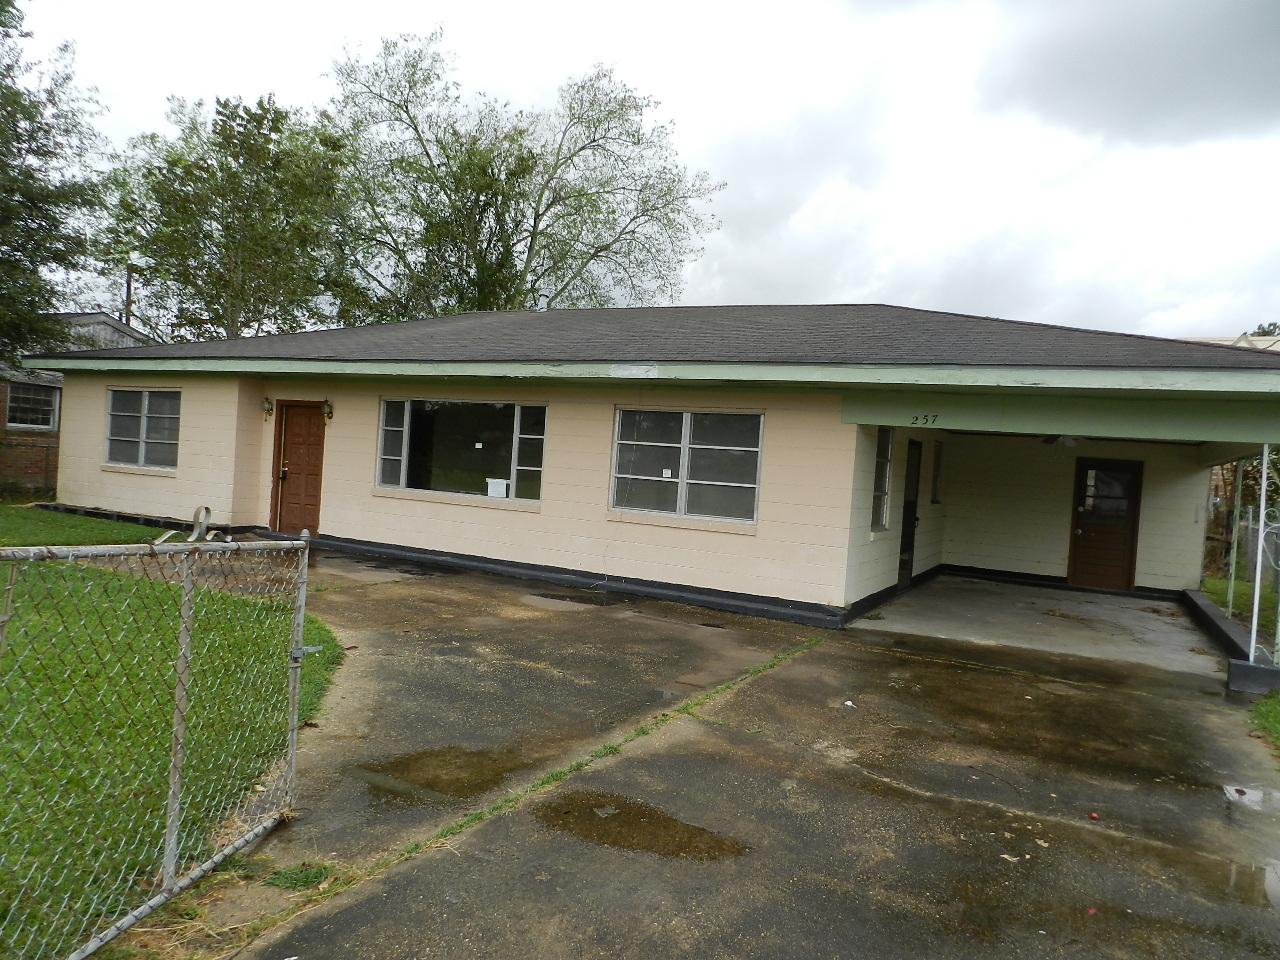 257 E 26th St, Reserve, Louisiana 70084